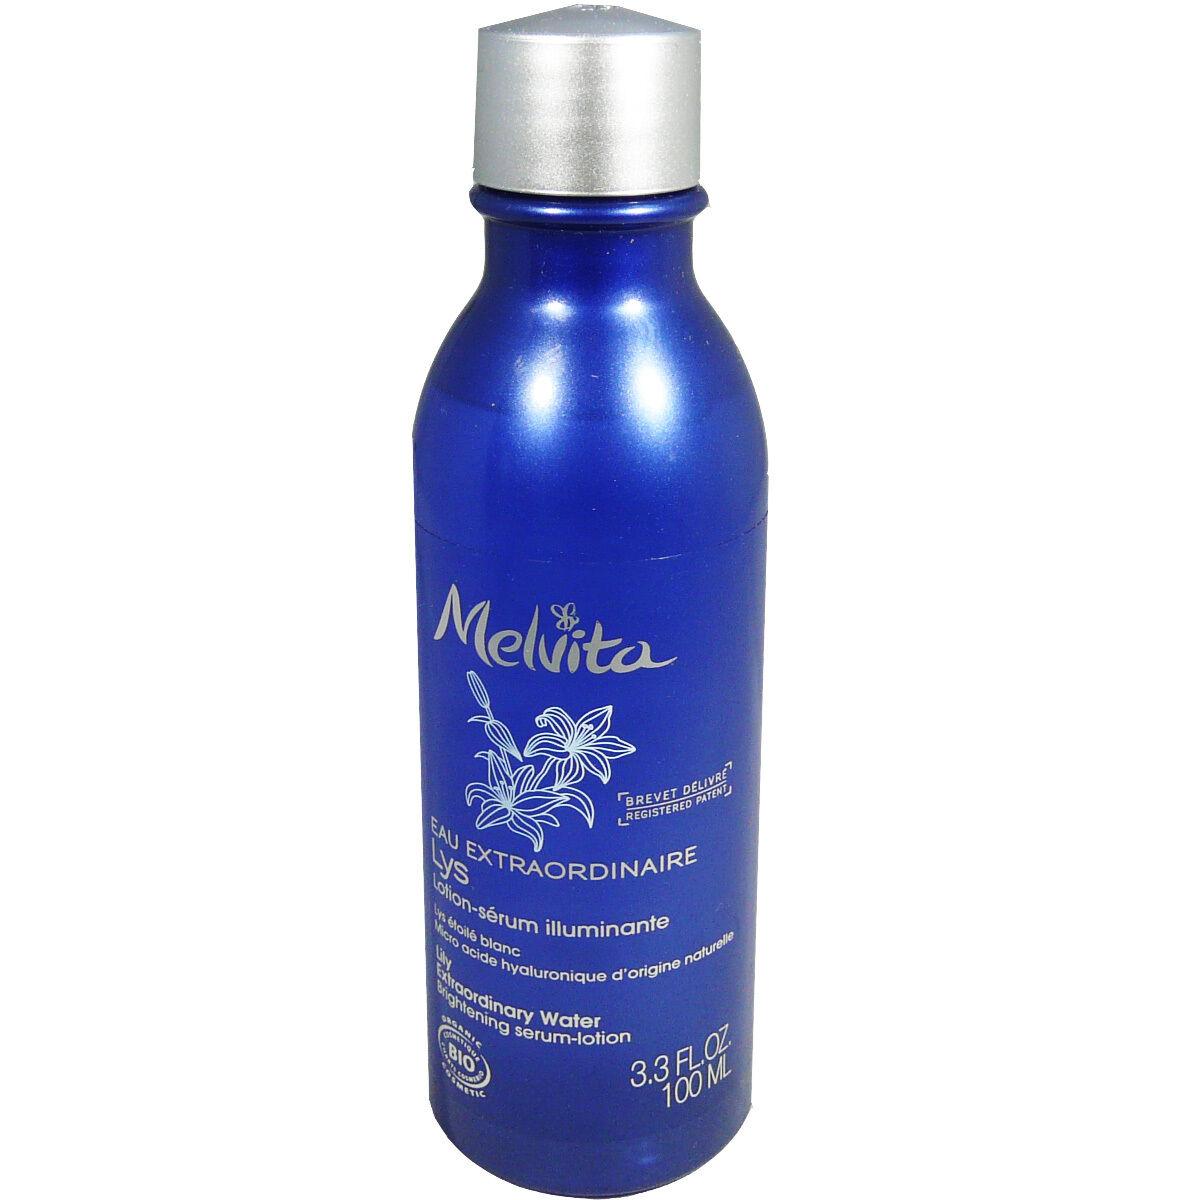 Melvita eau extraordinaire lys bio 100 ml